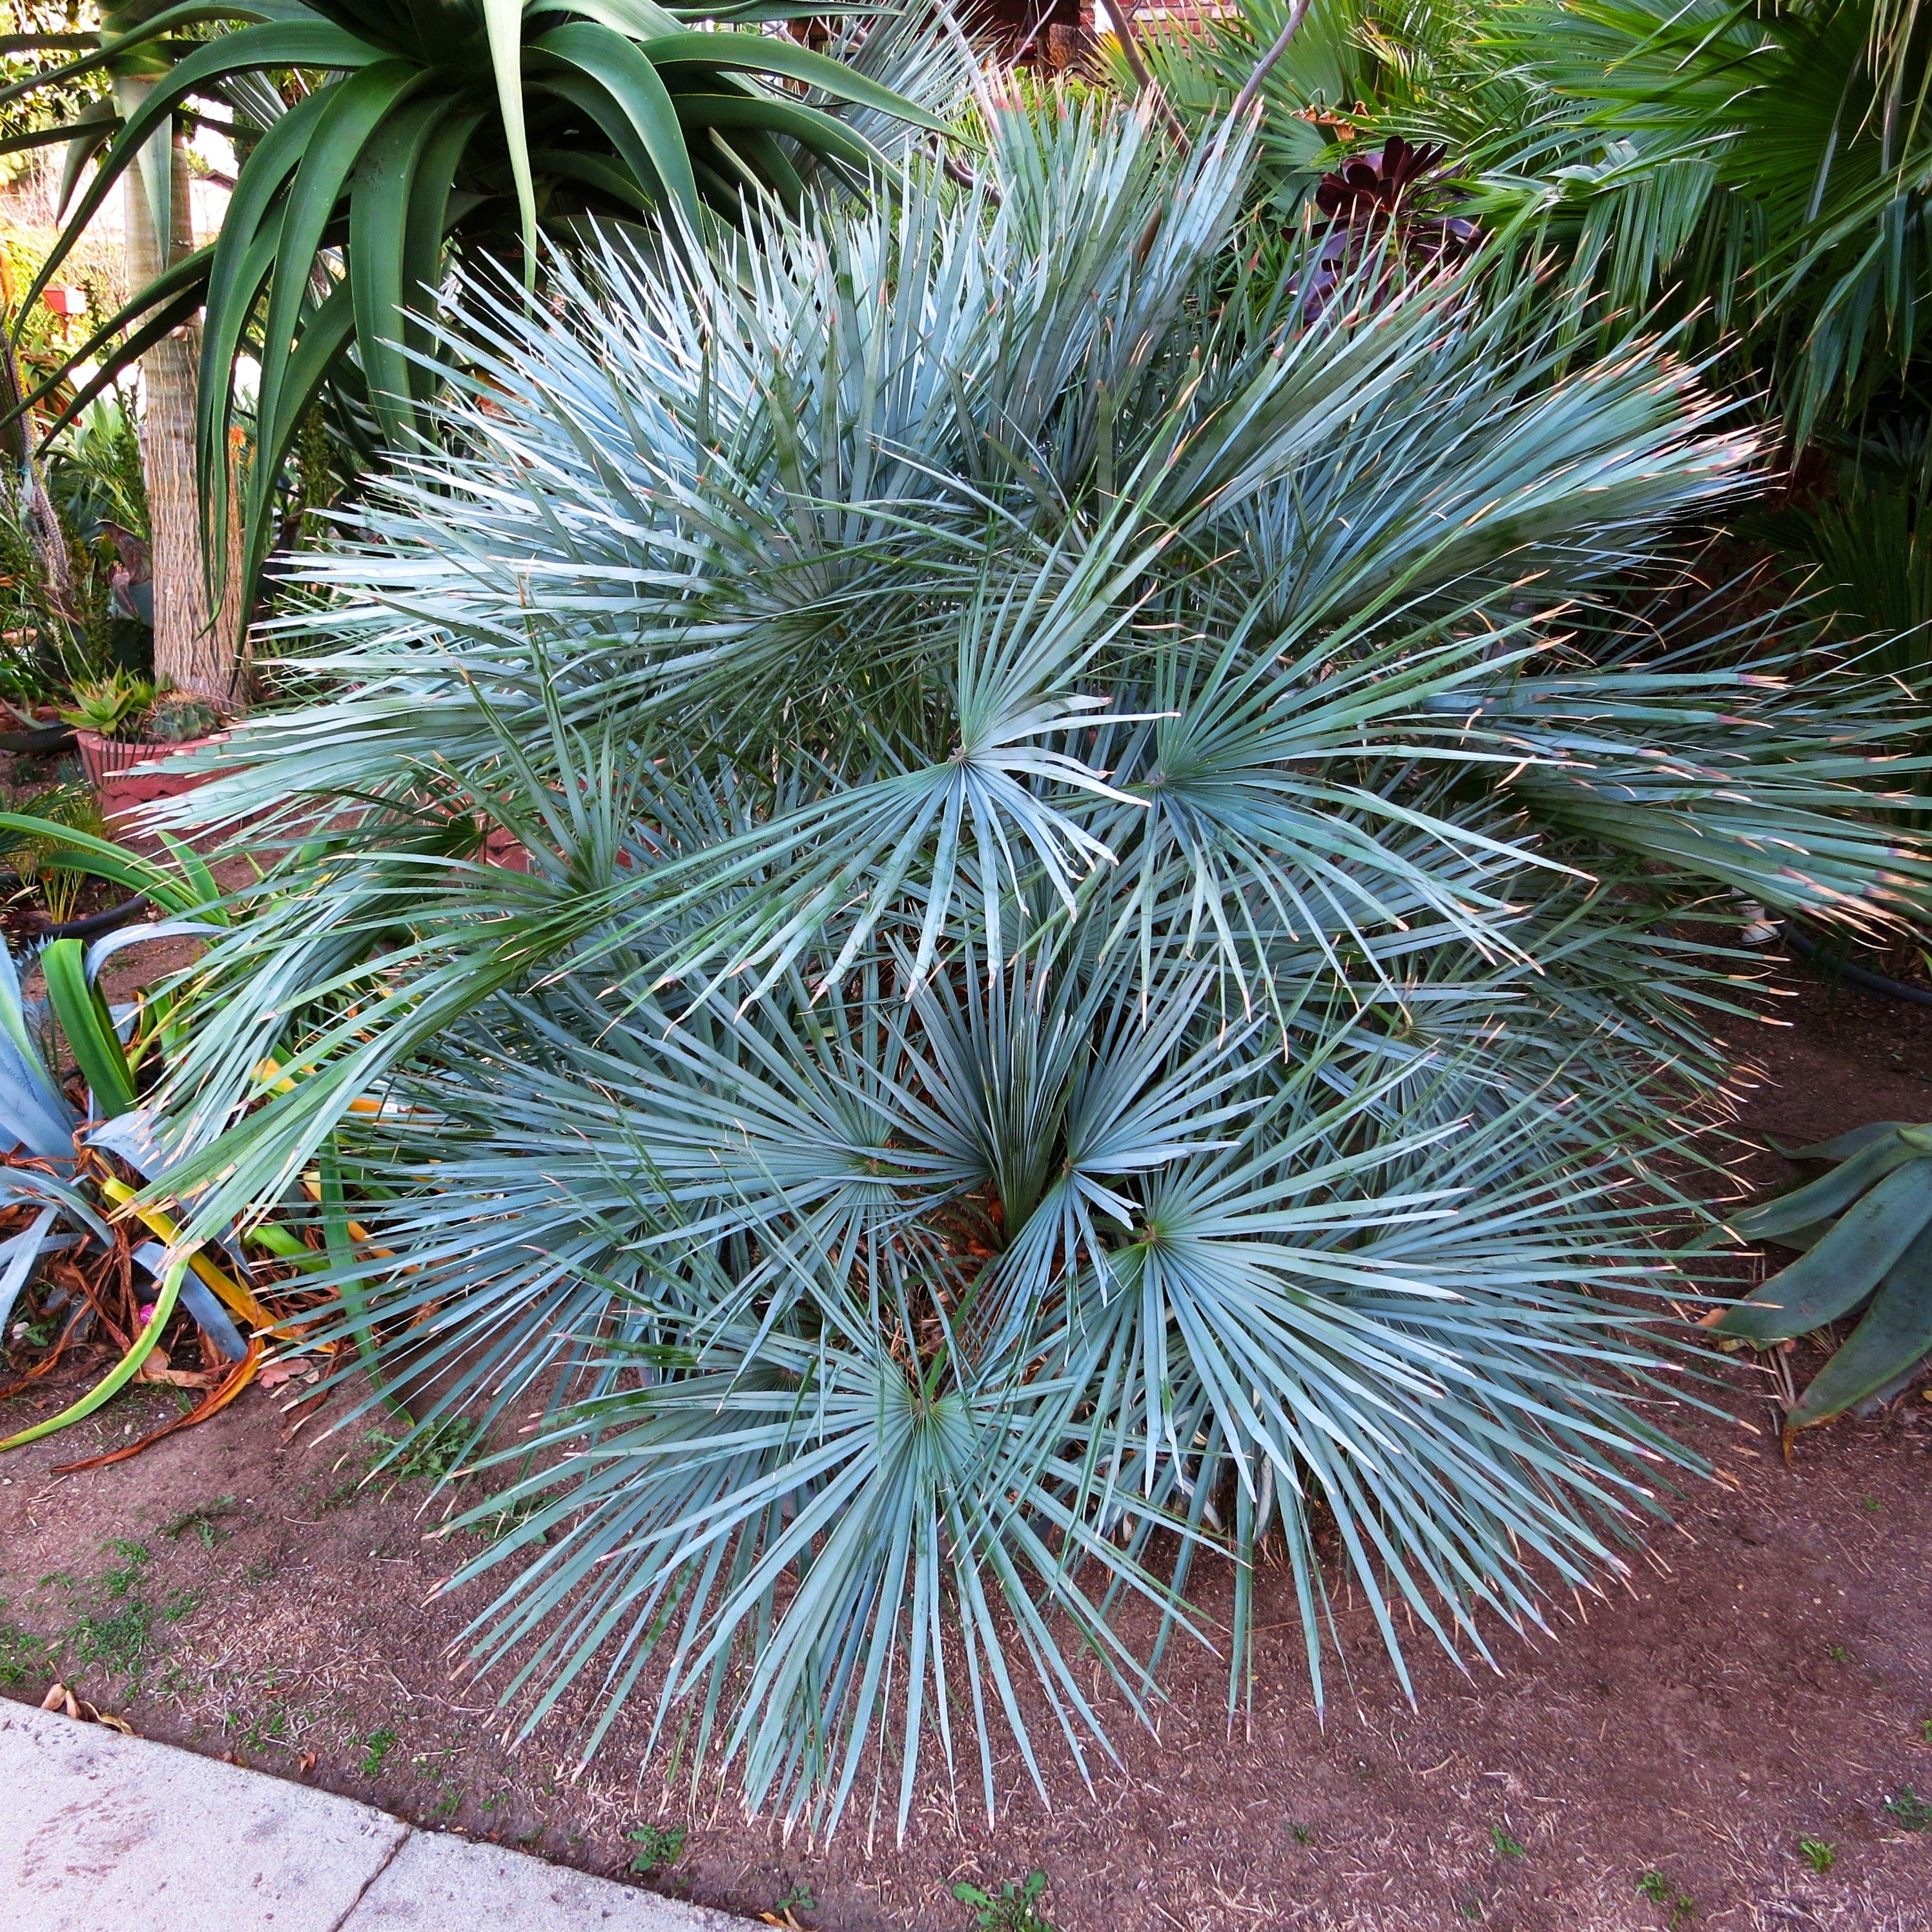 chamaerops humilis var argentea aka cerifera southern california palm photos original palm. Black Bedroom Furniture Sets. Home Design Ideas